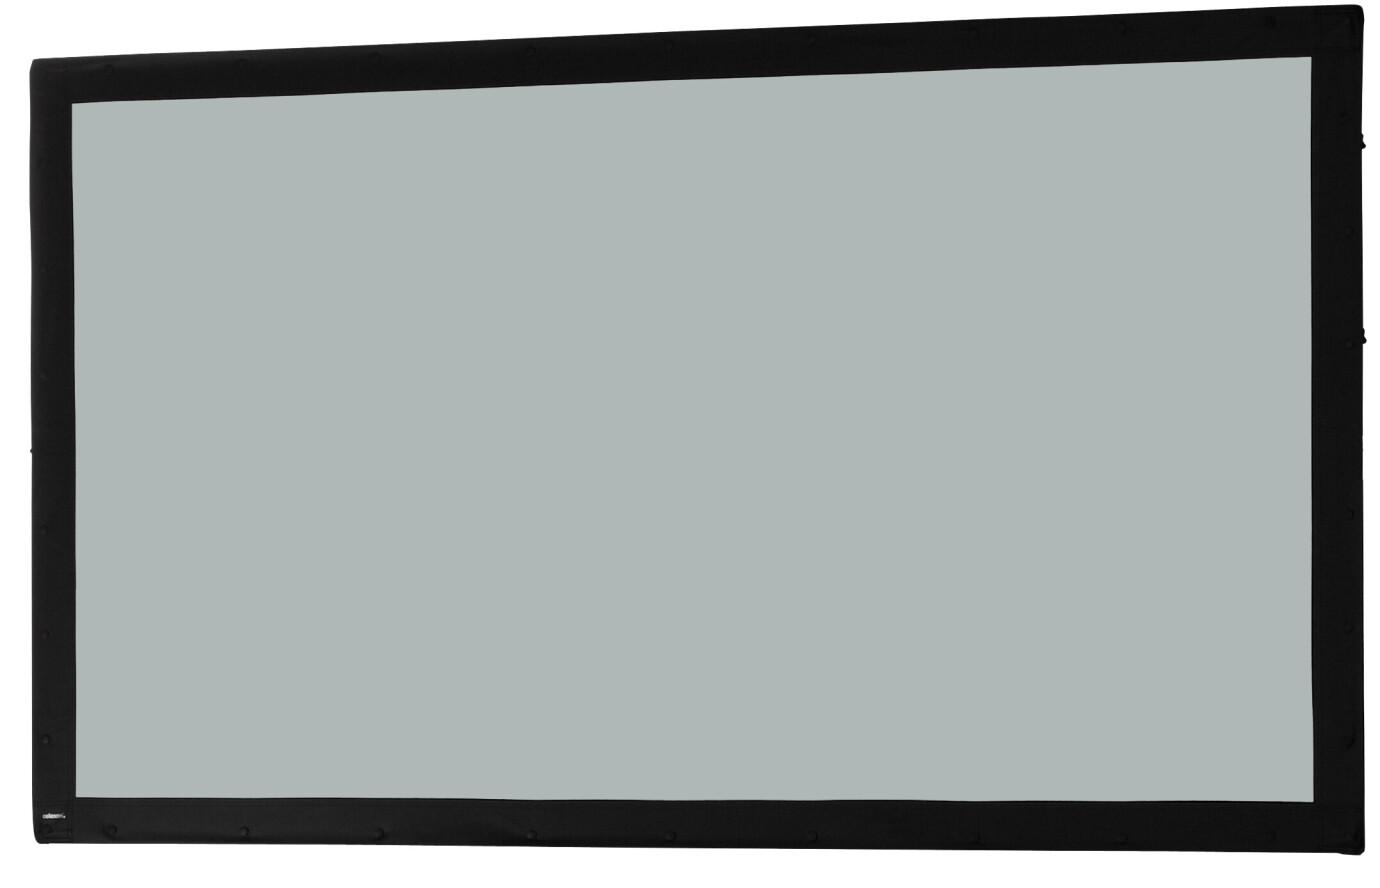 Telo per schermo pieghevole celexon Mobil Expert - 244 x 137 cm